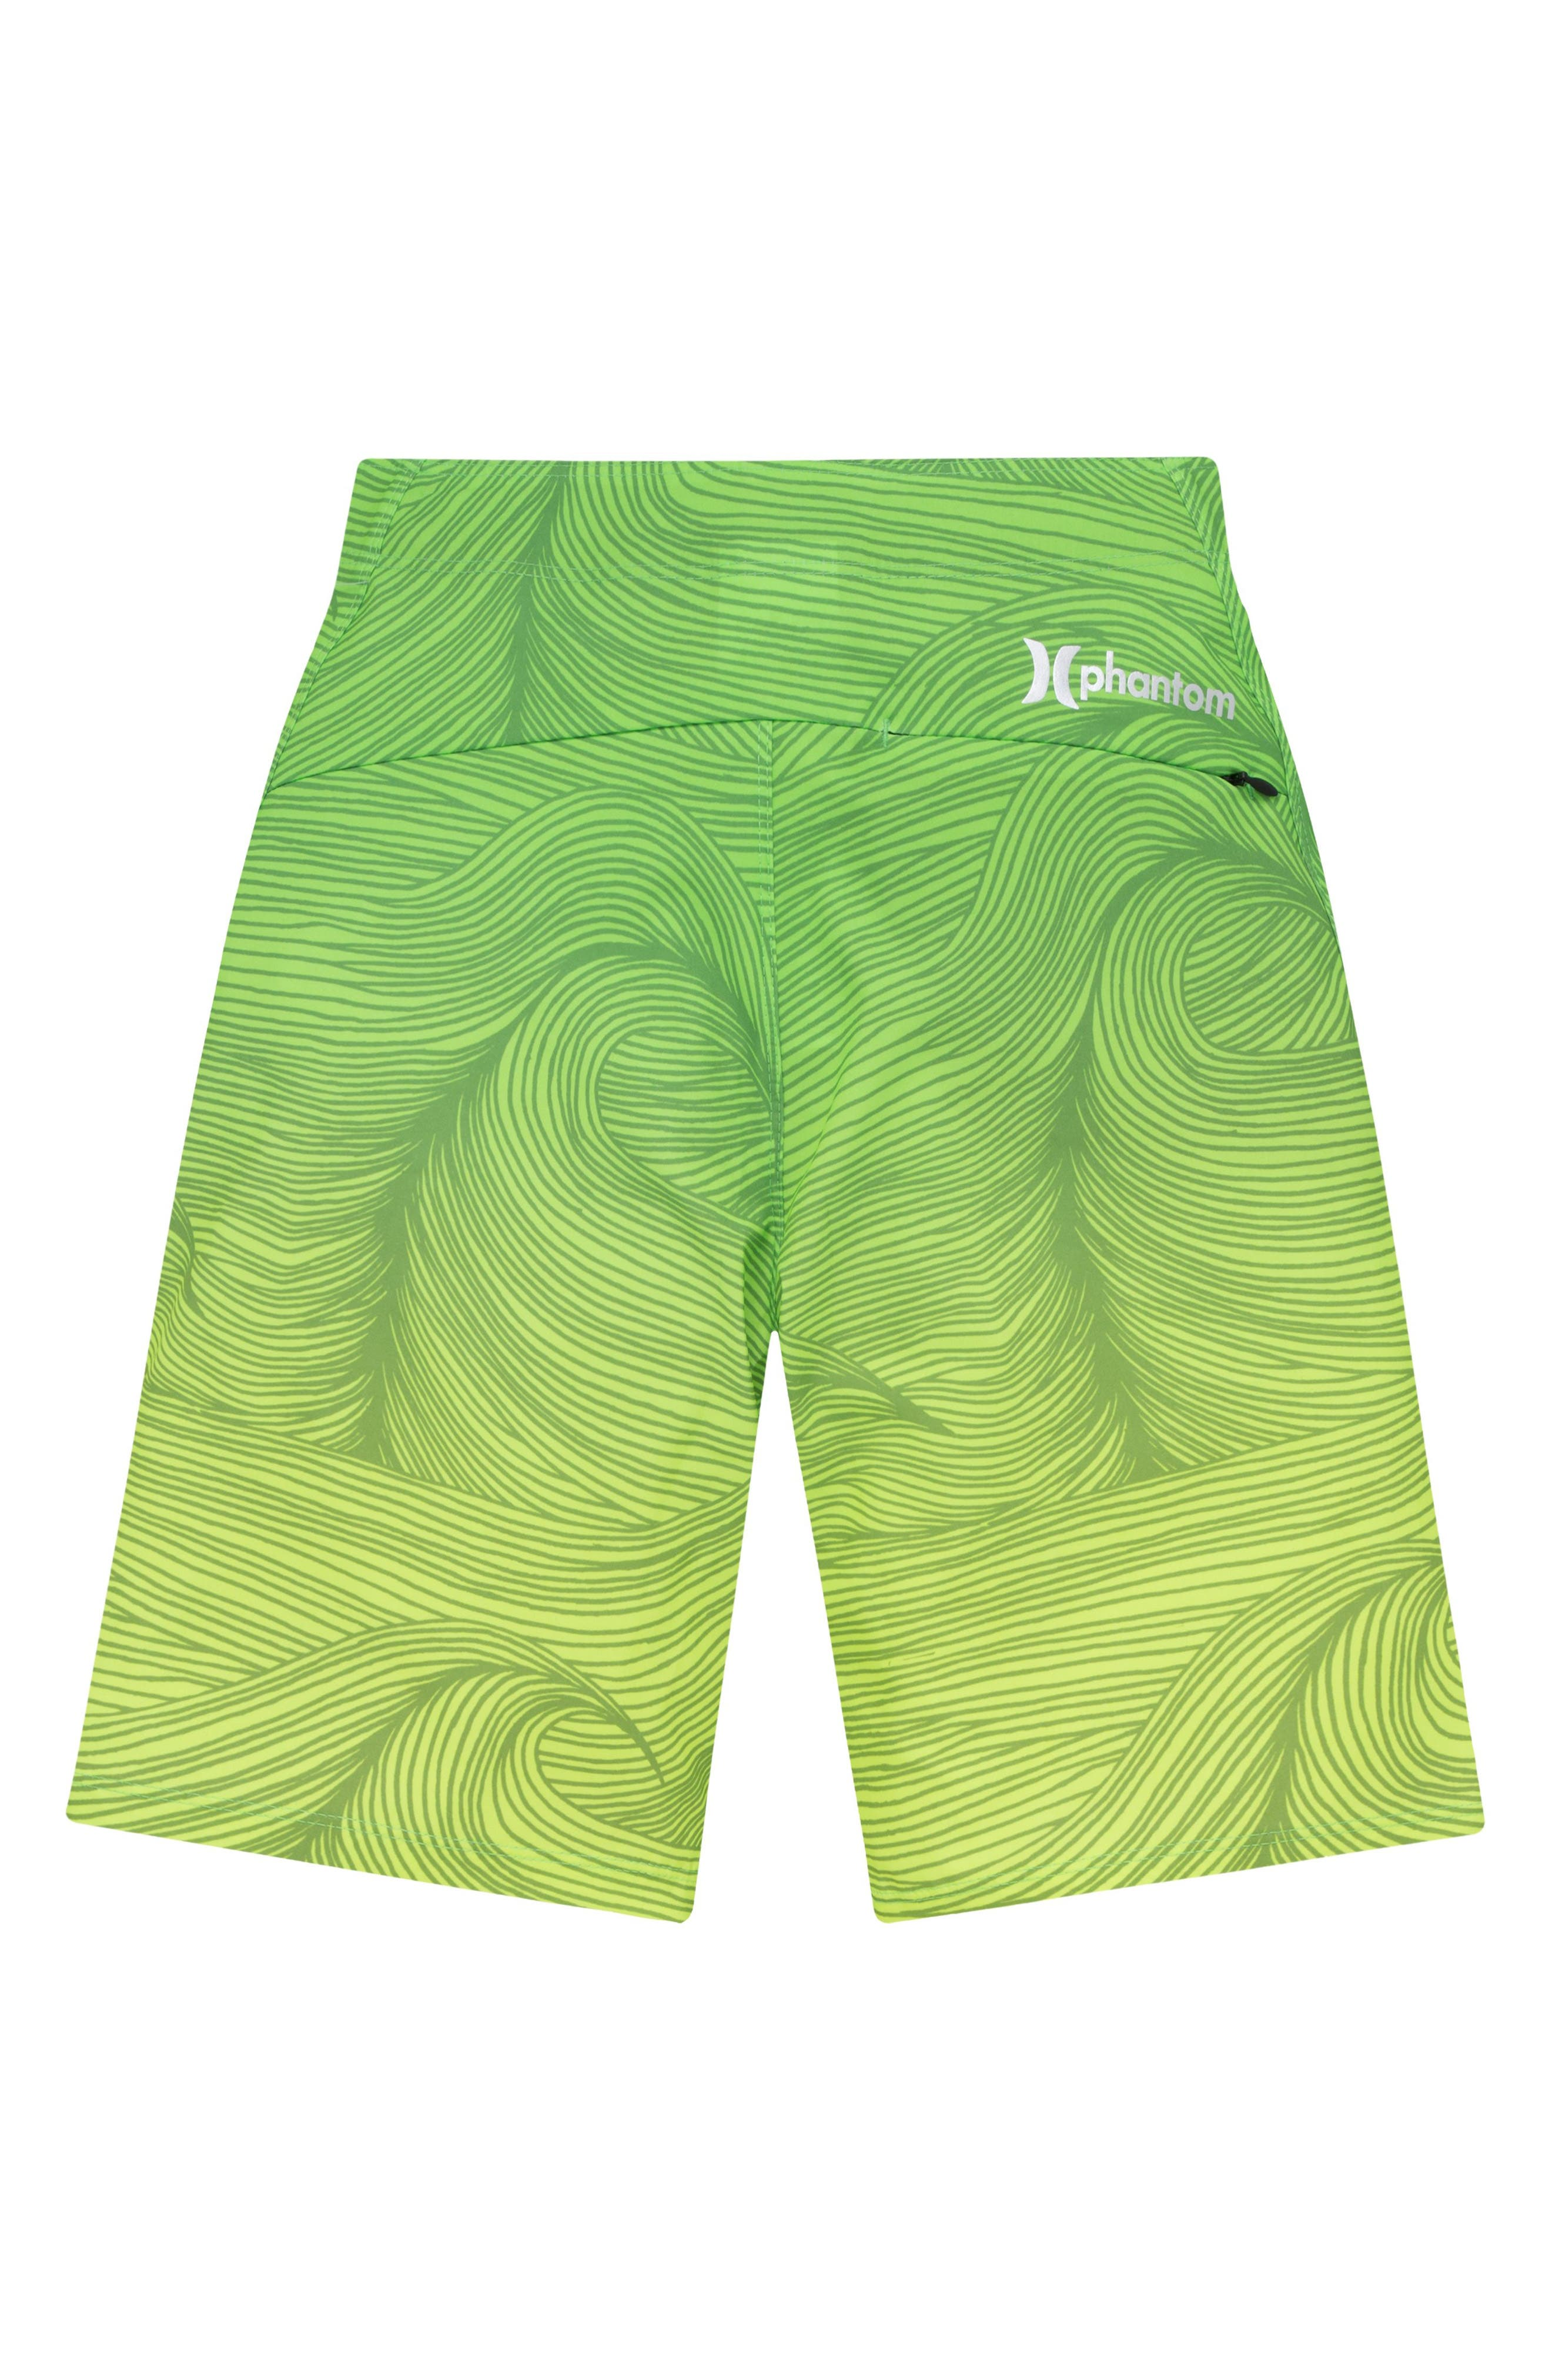 Phantom 30 Brooks Board Shorts,                             Alternate thumbnail 2, color,                             Voltage Green